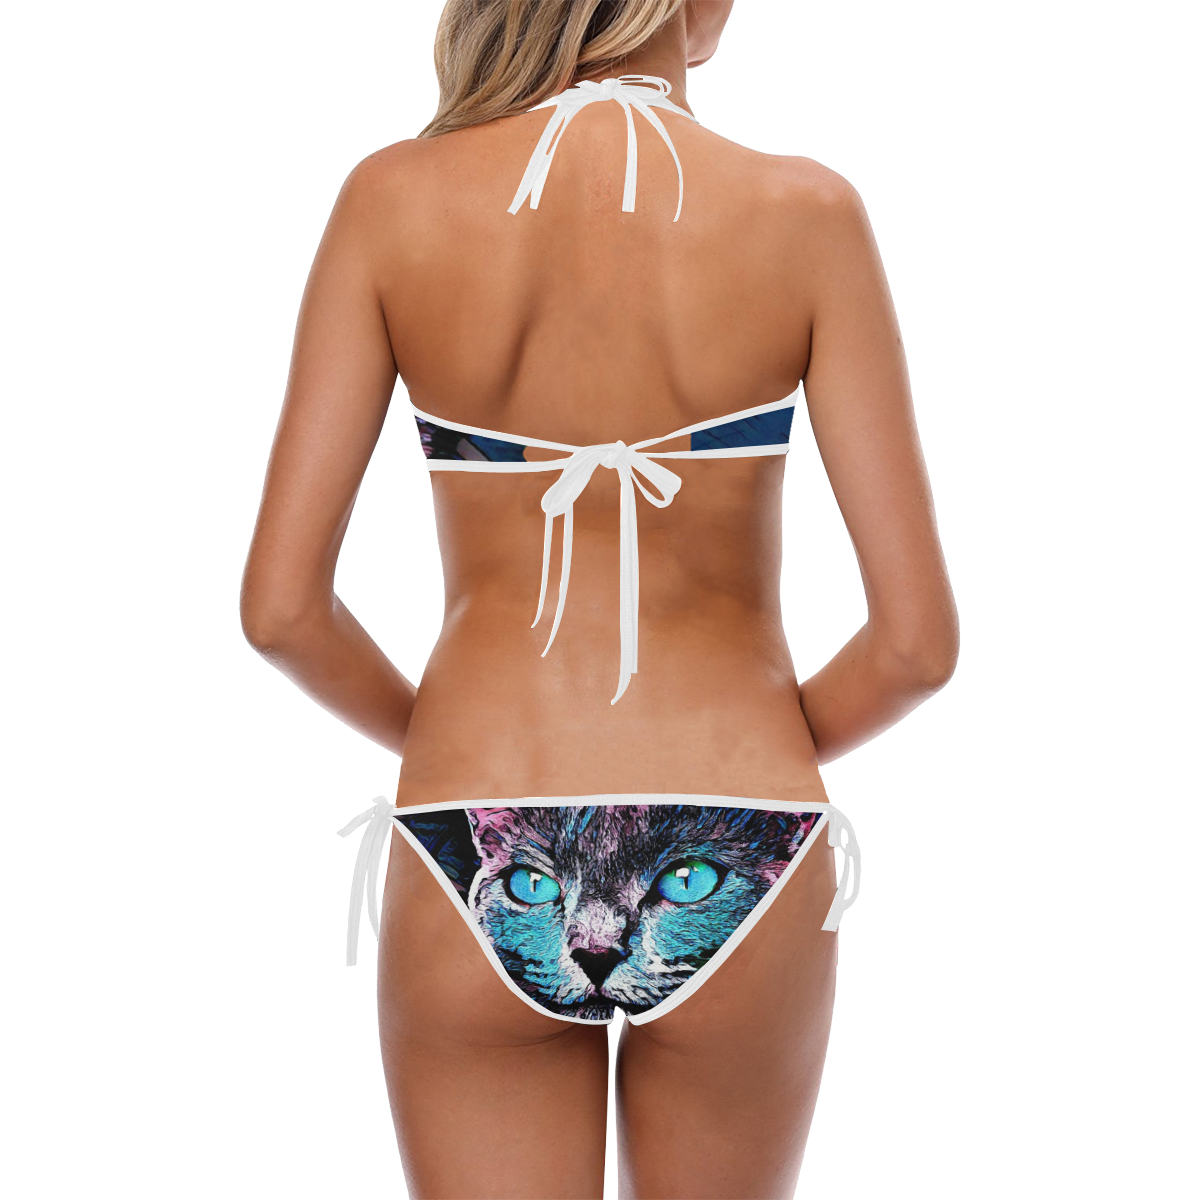 CAT ART BLANC Custom Halter & Side Tie Bikini Swimsuit (Model S06)